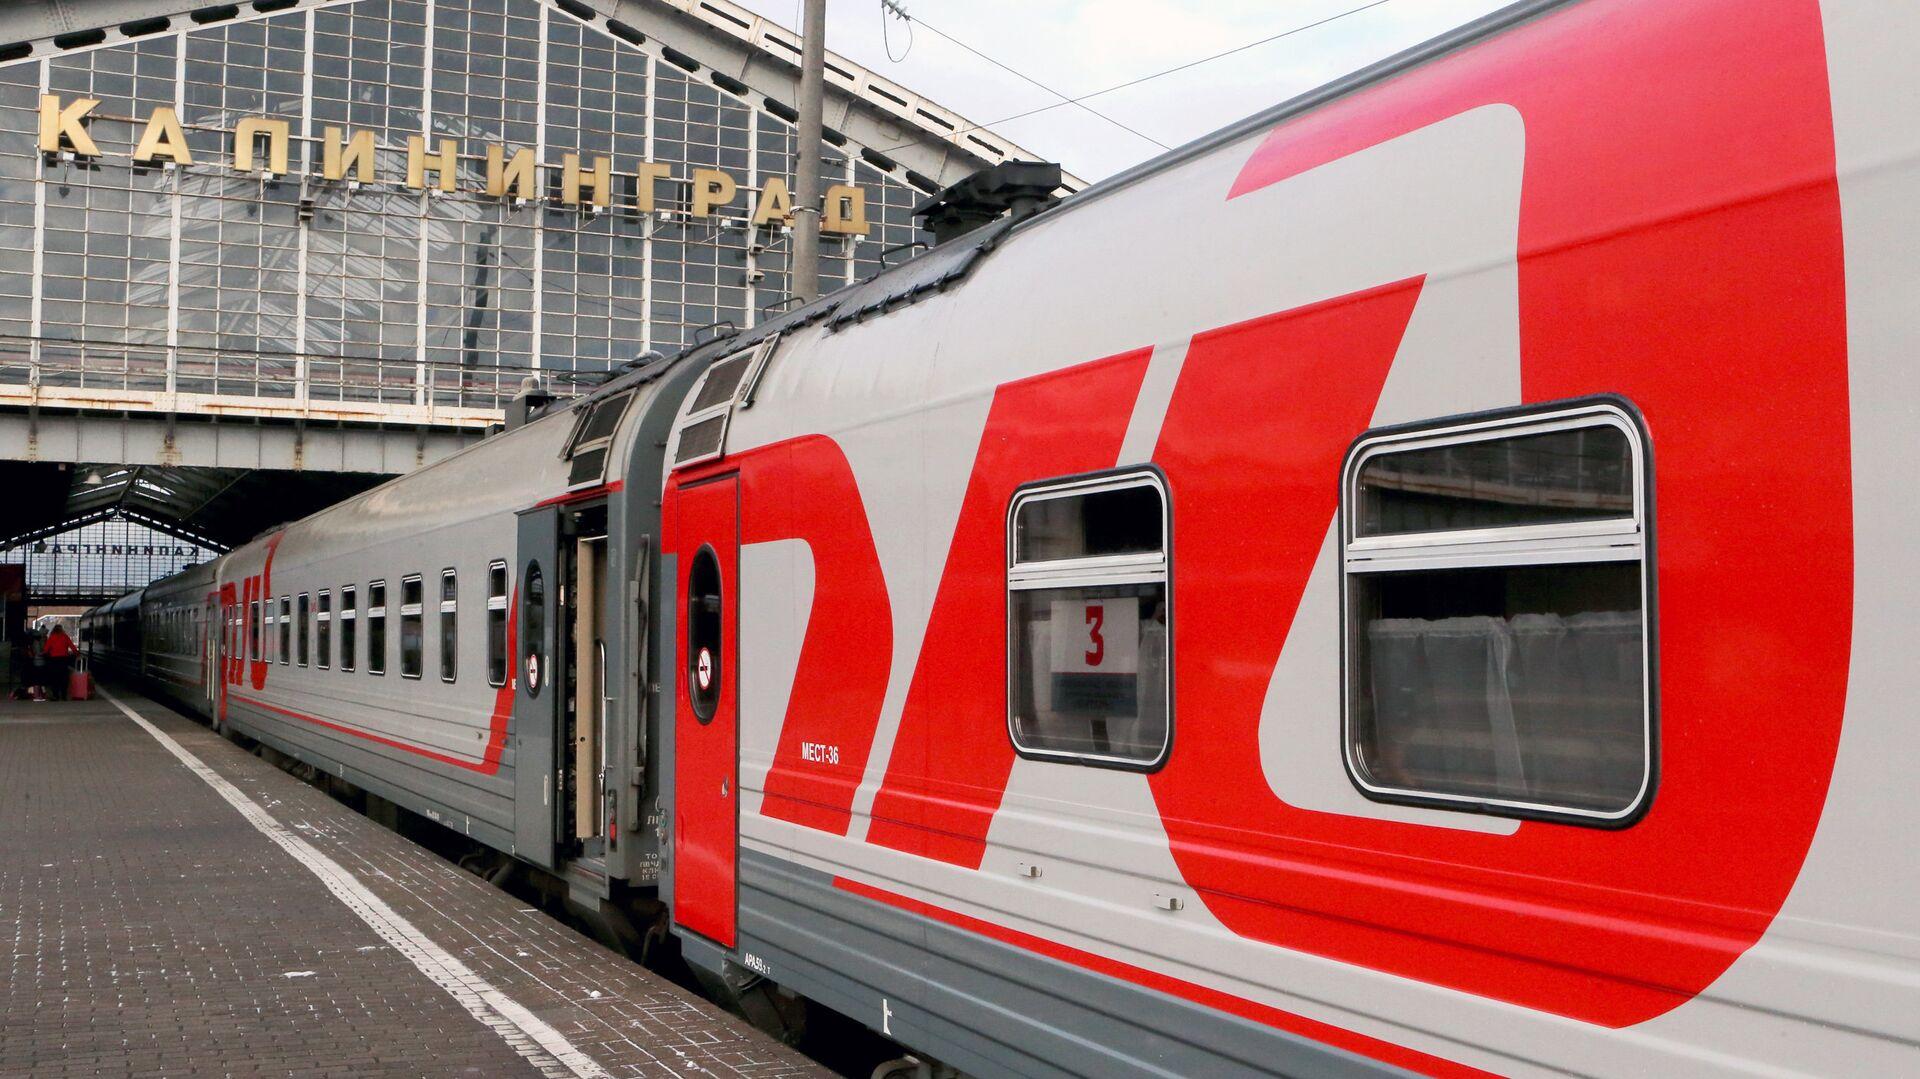 Поезд Москва-Калининград - РИА Новости, 1920, 21.09.2020